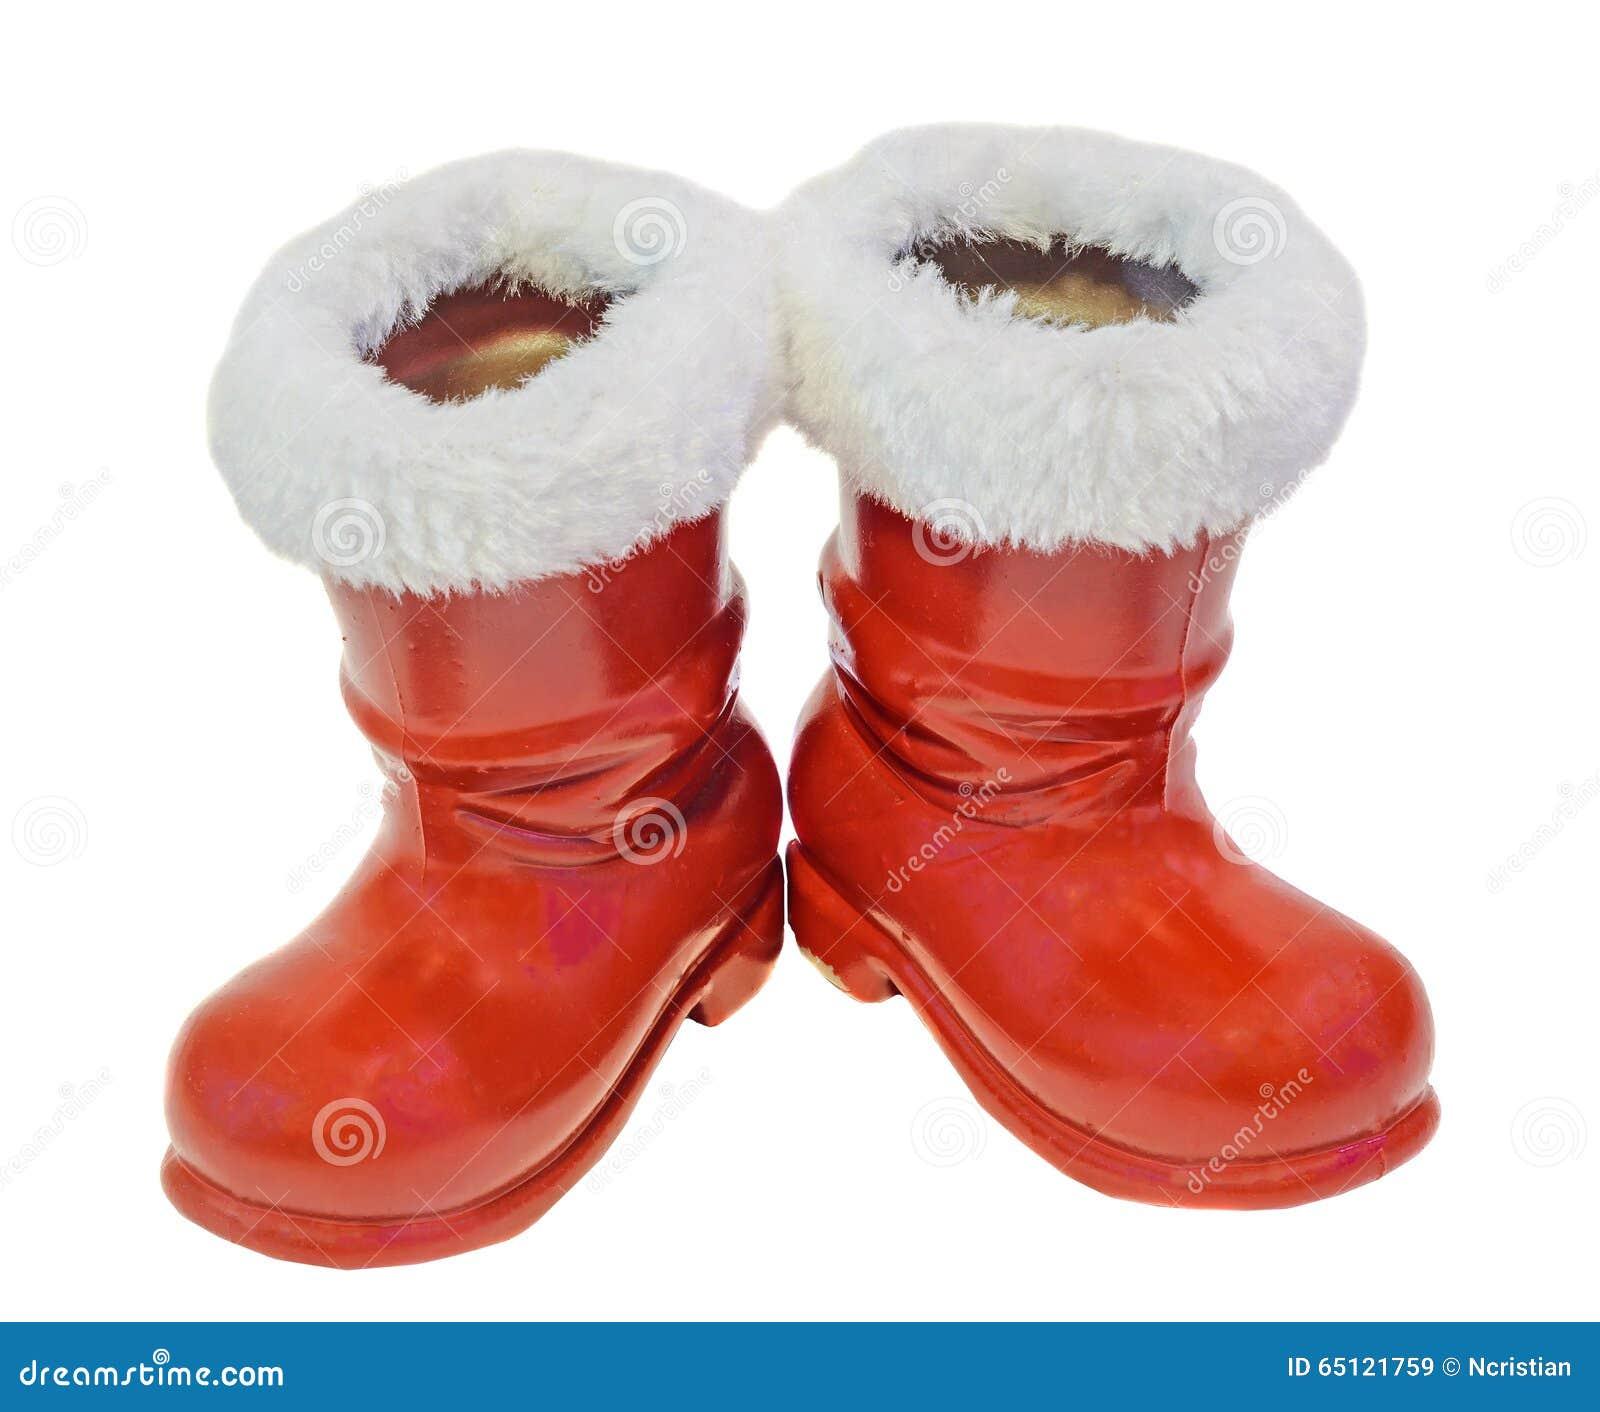 Red santa claus boots shoes saint nicholas gifts